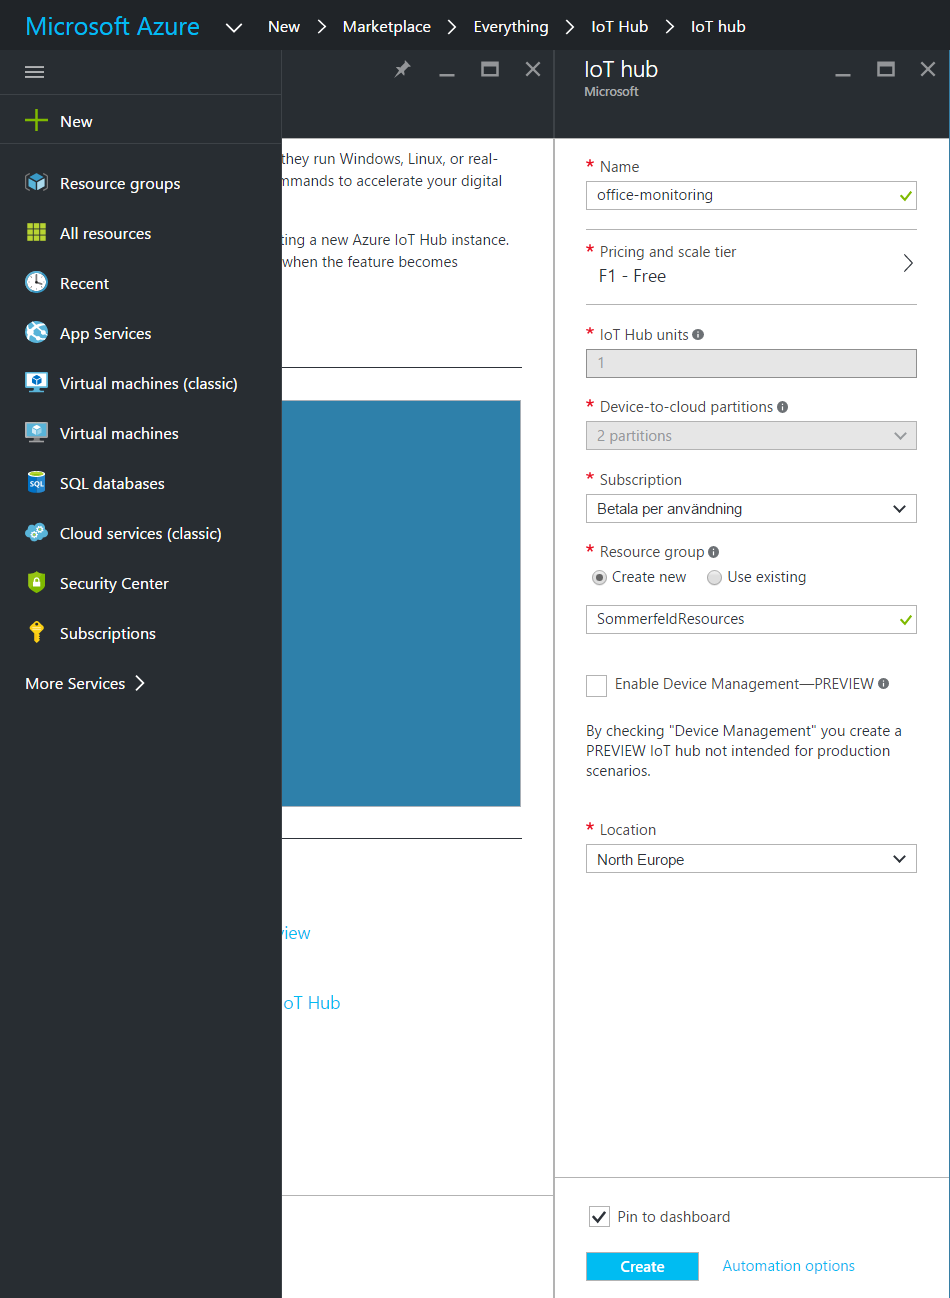 Registering Azure IoT Hub in Azure Portal